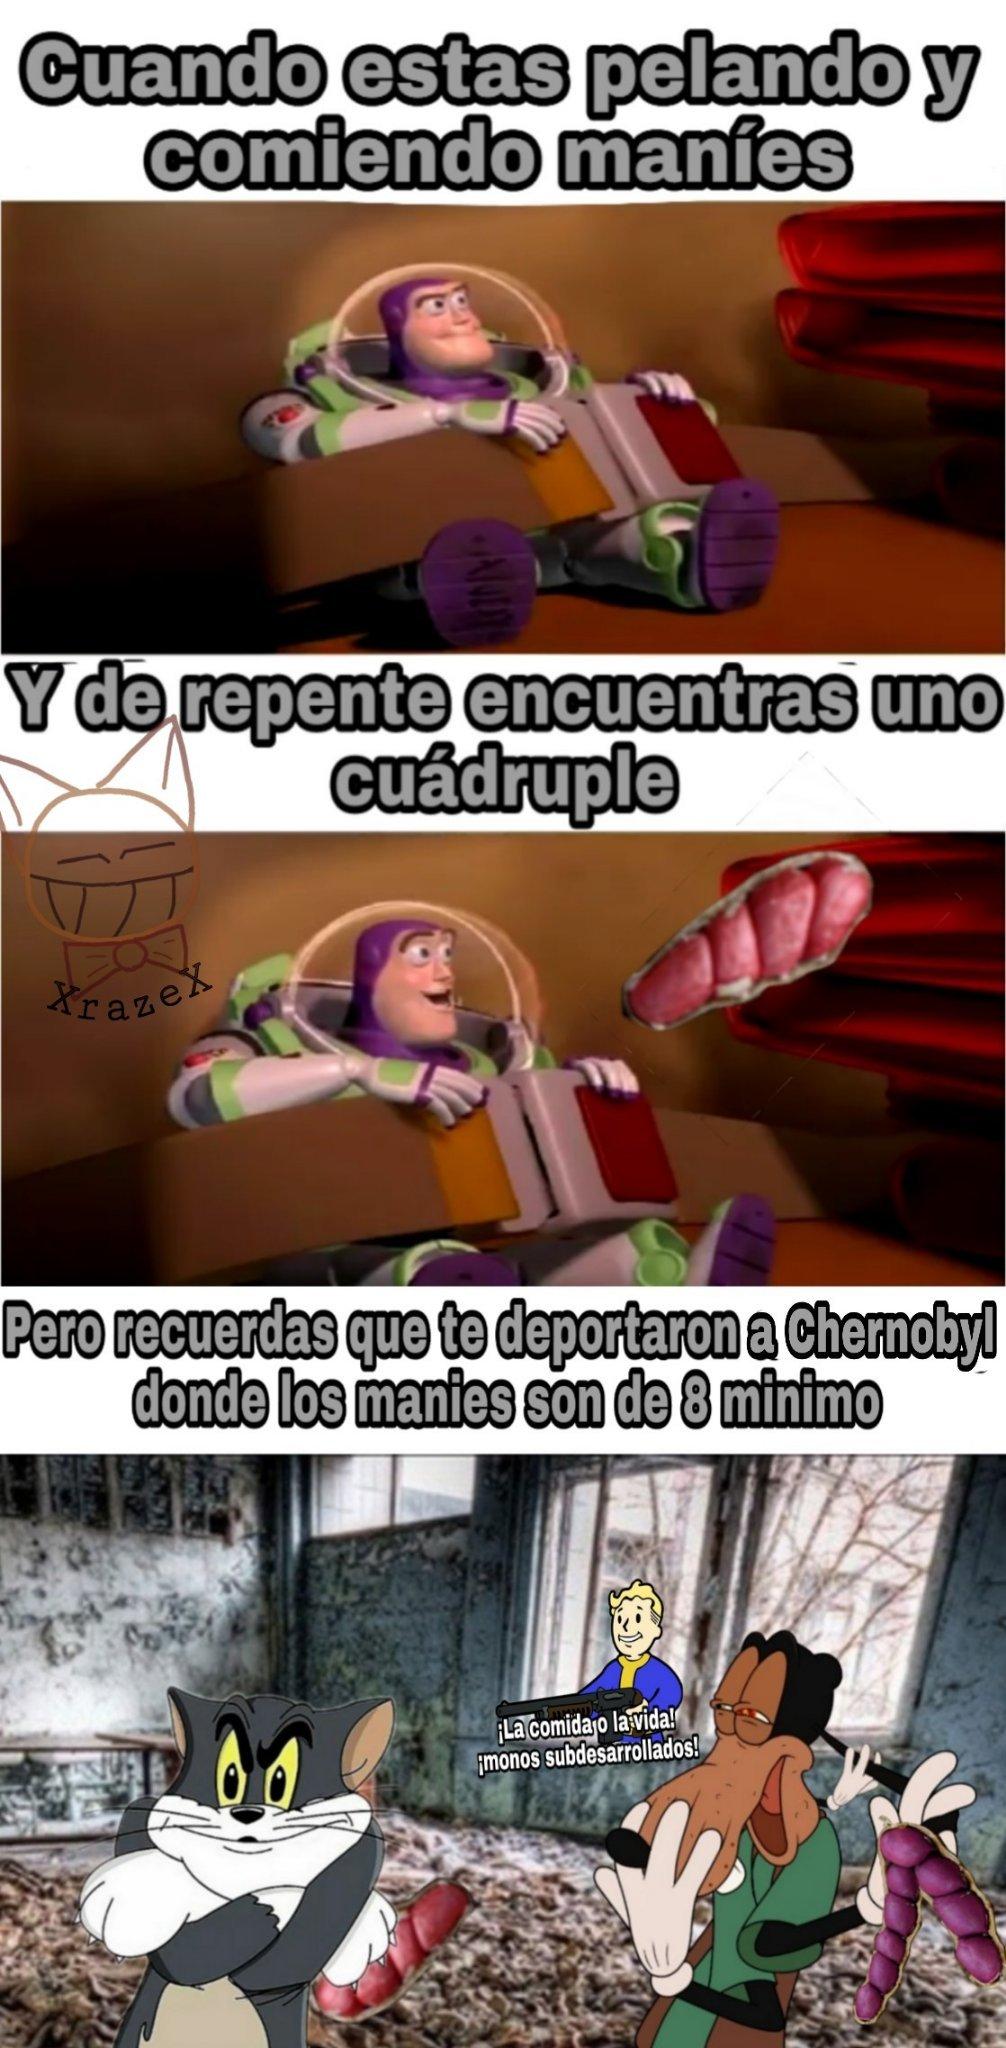 Maníes manises manís - meme